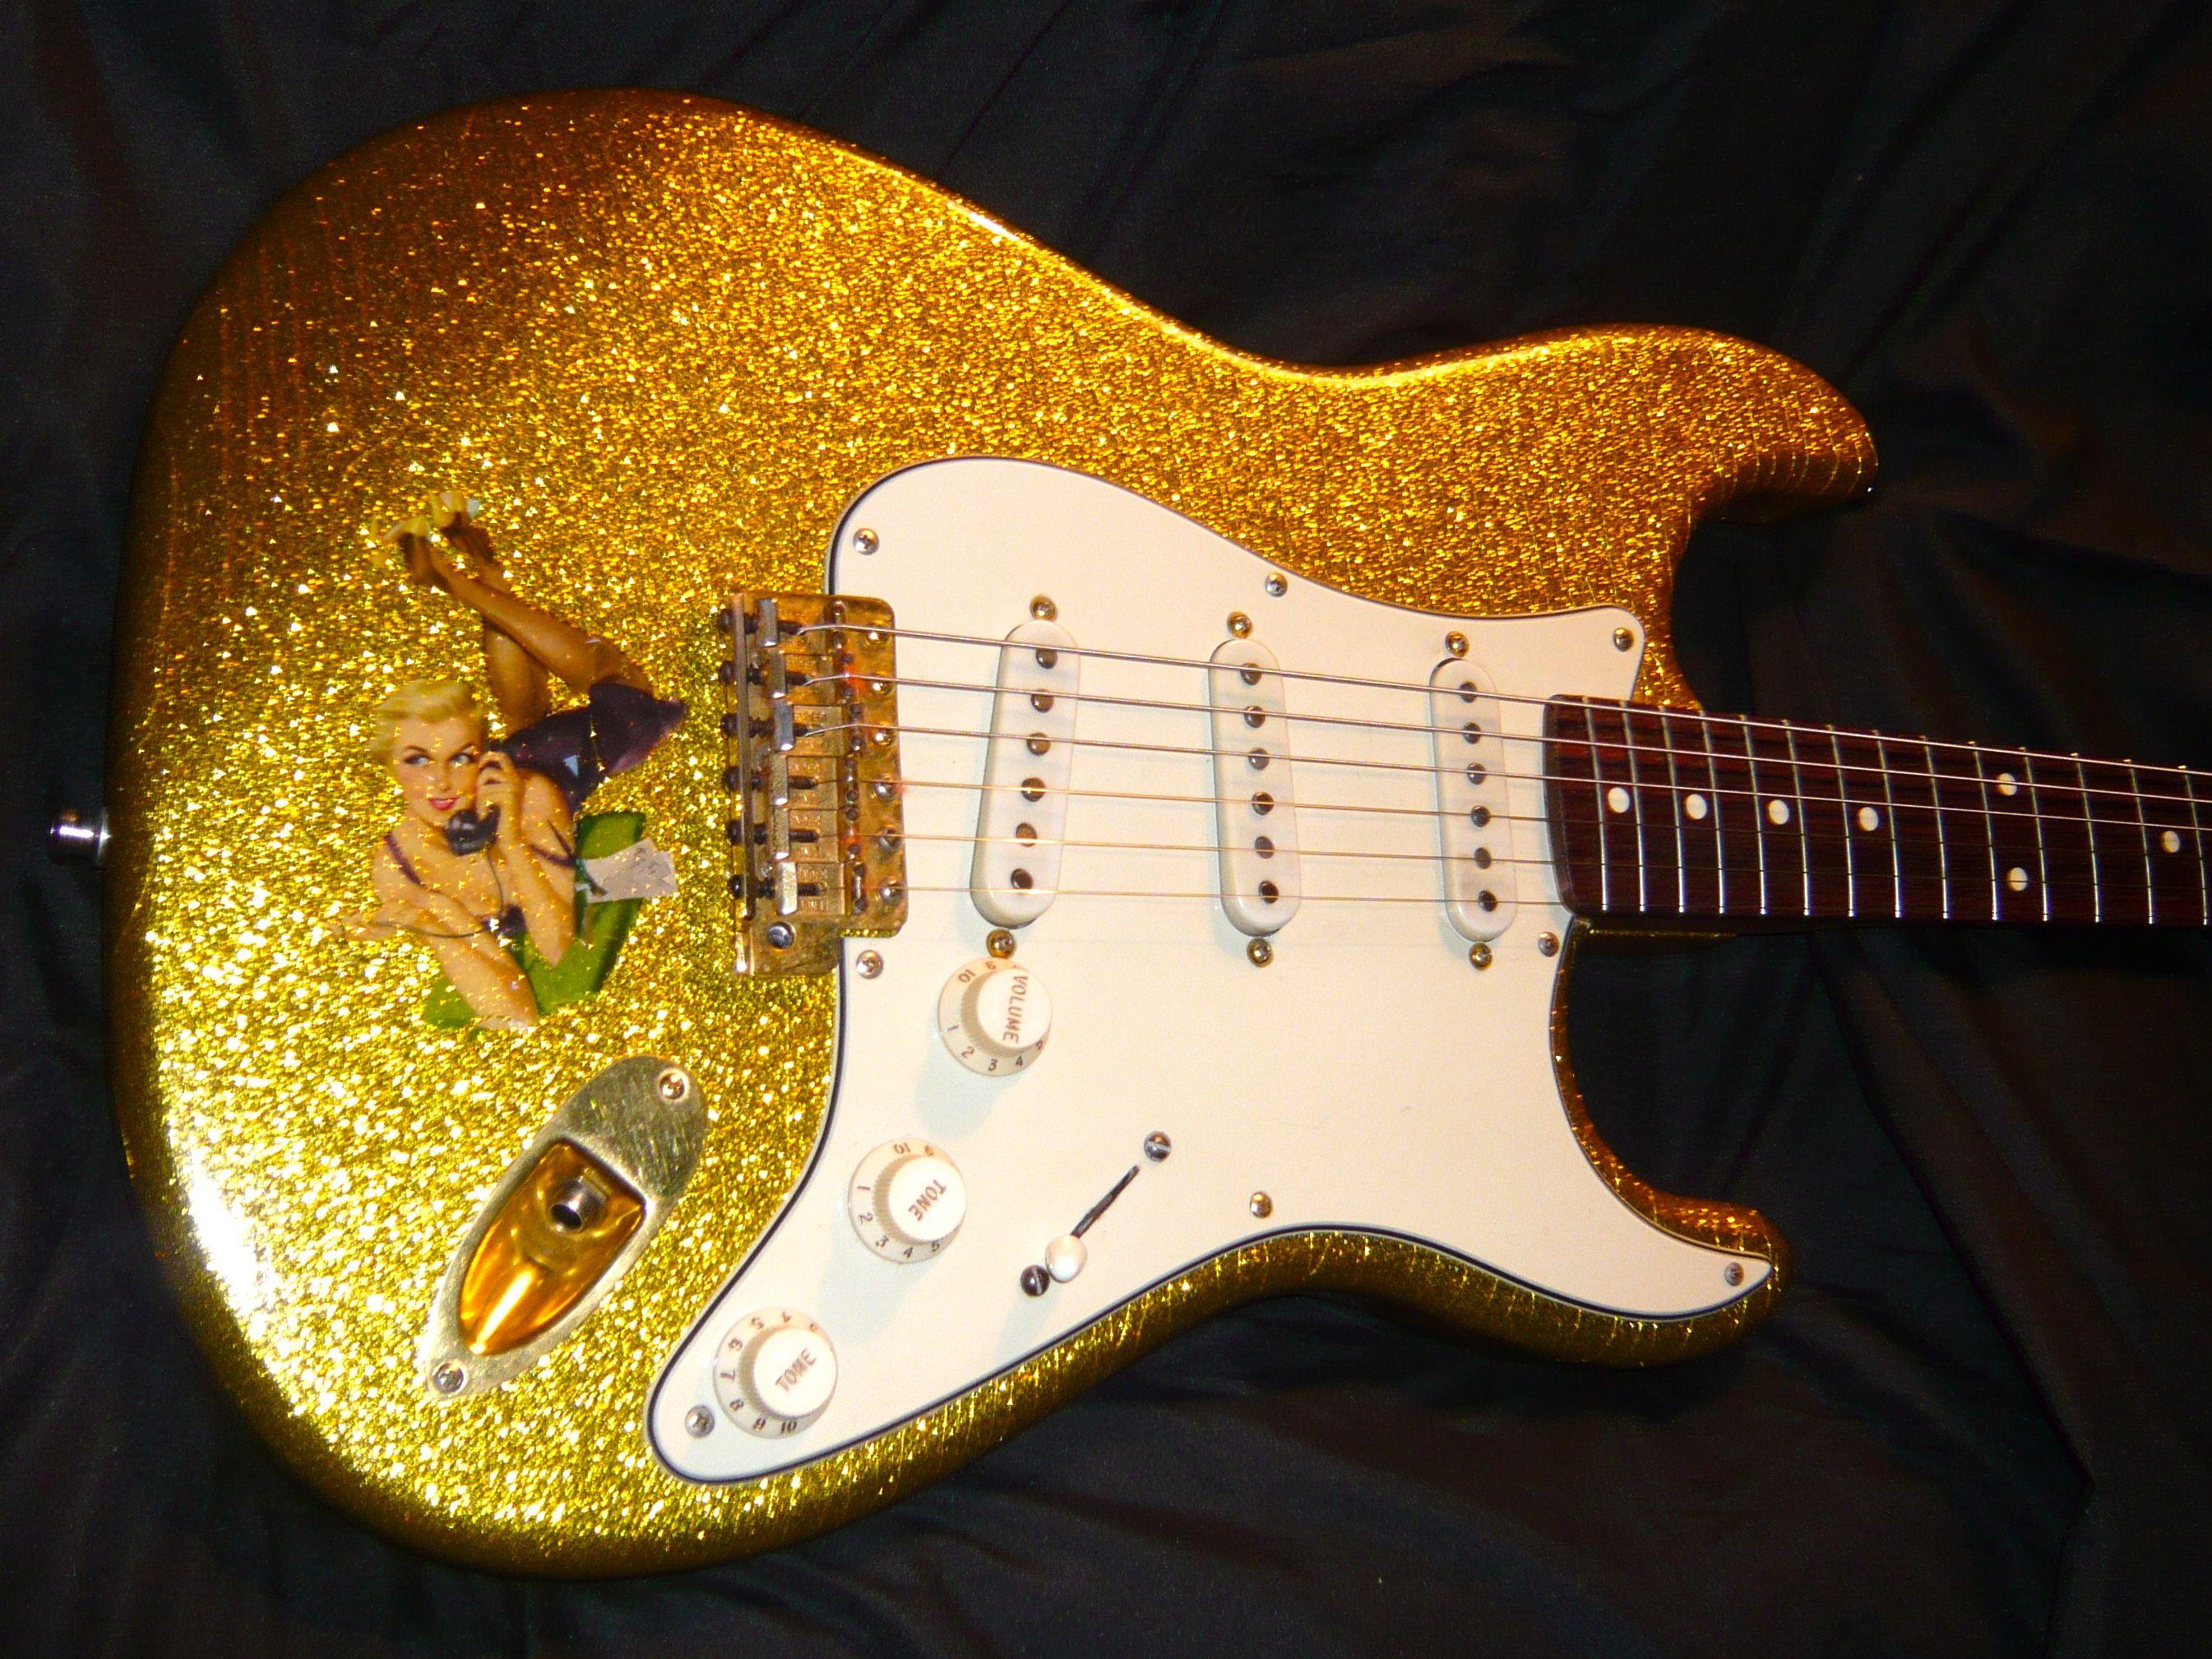 Fender Stratocaster 1993 Joe Bonamassa Tune Your Sound